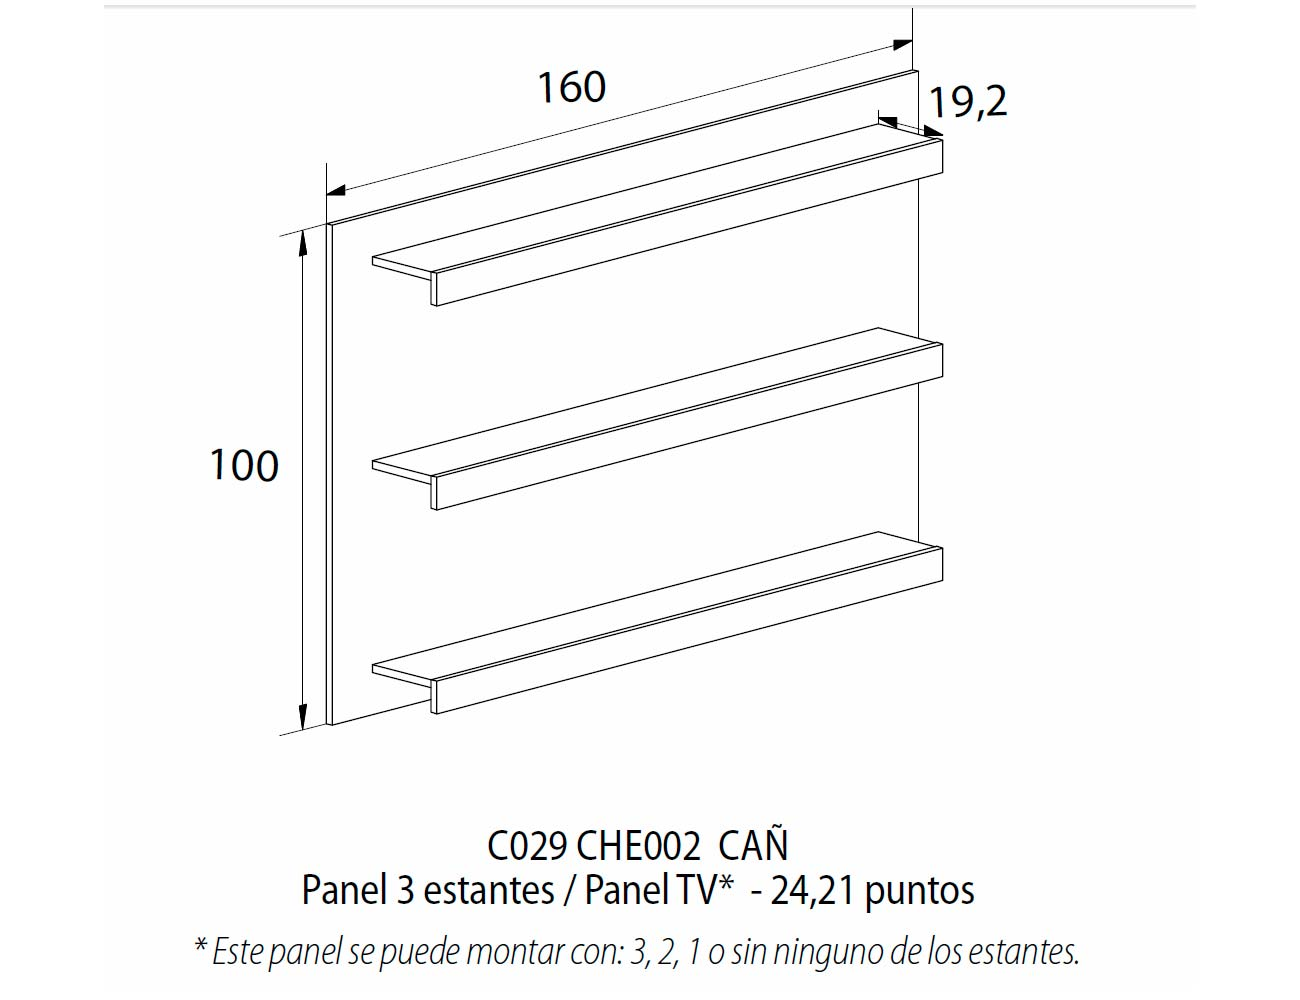 Panel 3 estantes